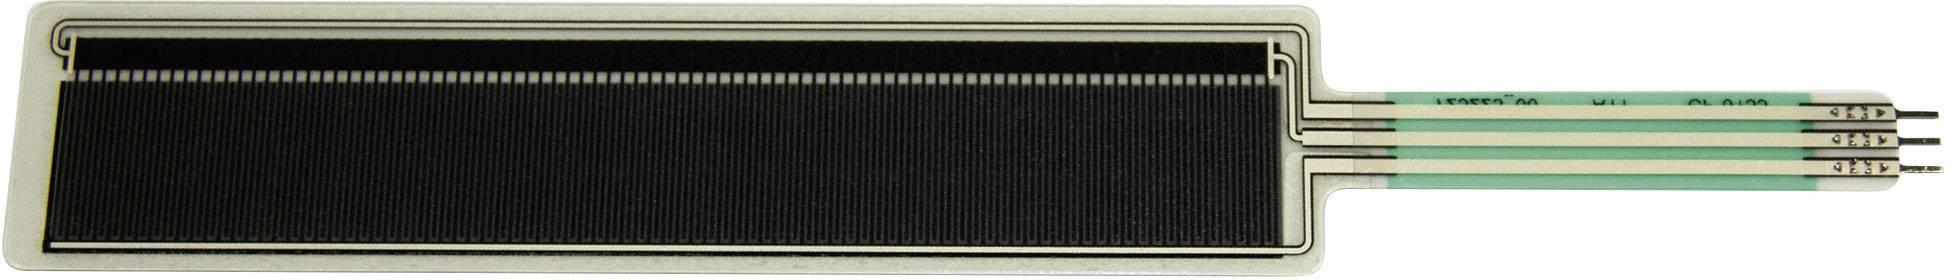 Senzor tlaku IEE CP29 (FSR155AS), CP29 (FSR155AS), 1.1 kg až 1.1 kg